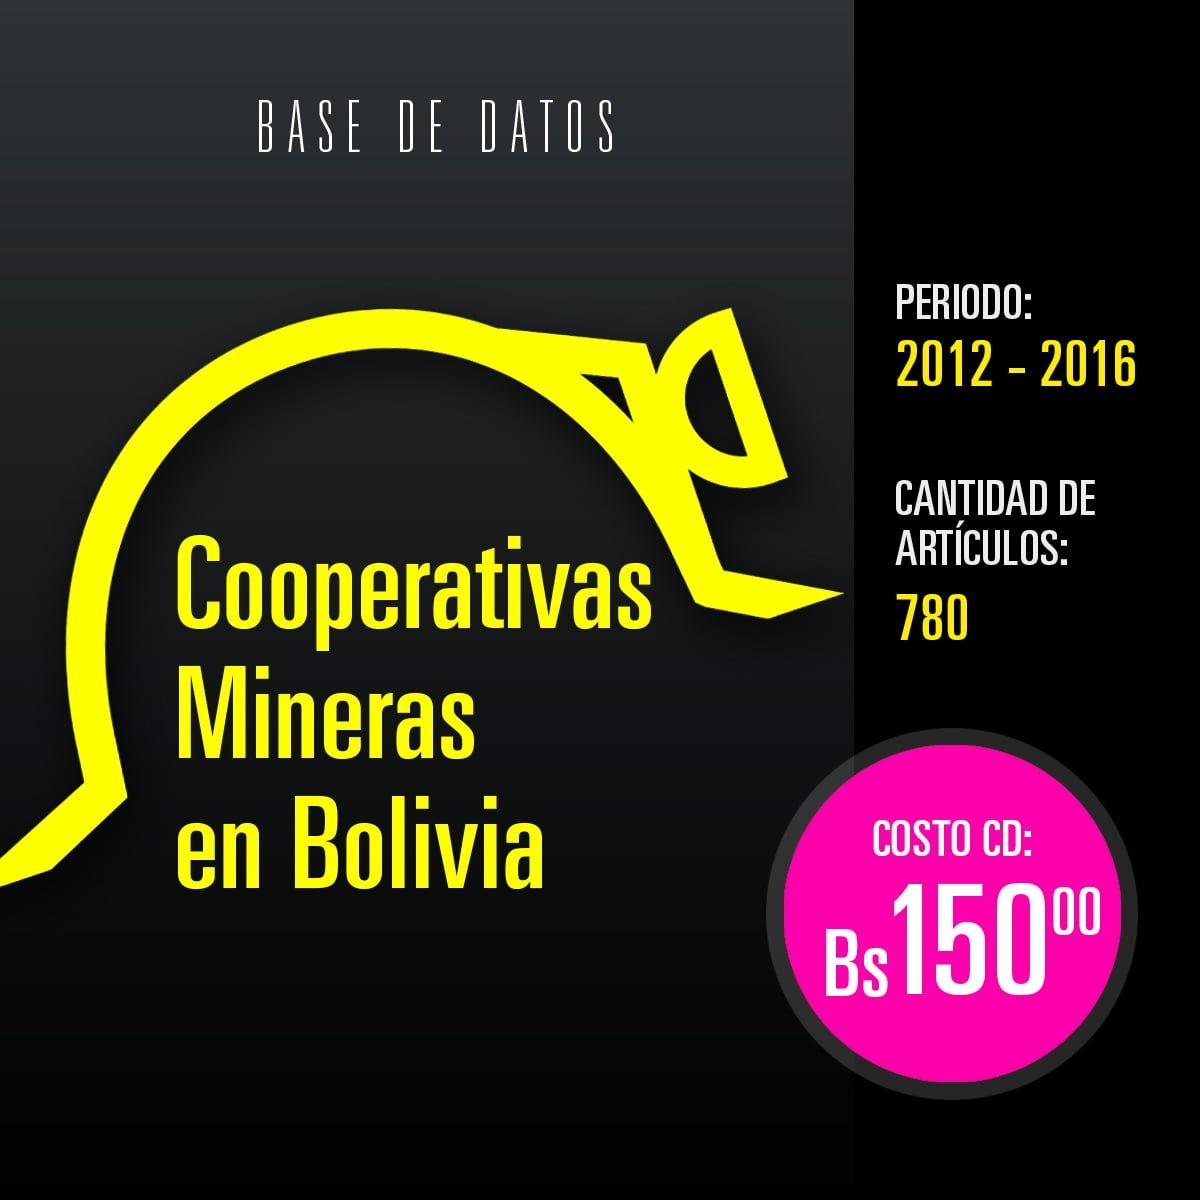 Cooperativas mineras en Bolivia: Base de datos hemerográfica